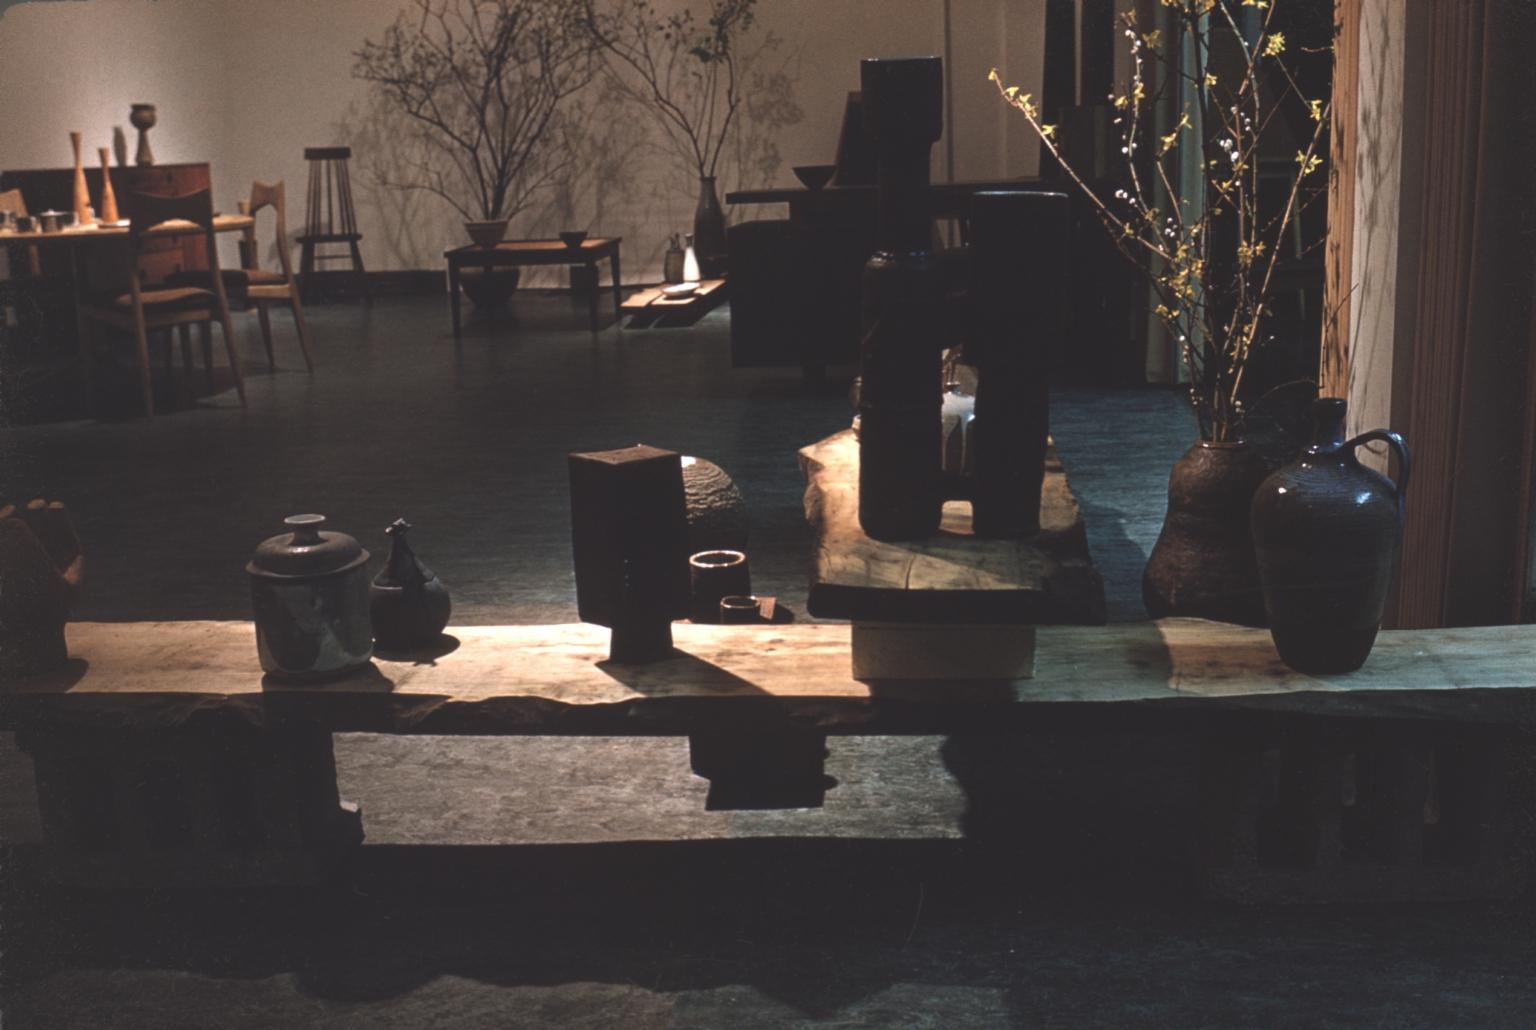 Exhibition of ceramic pieces and furniture